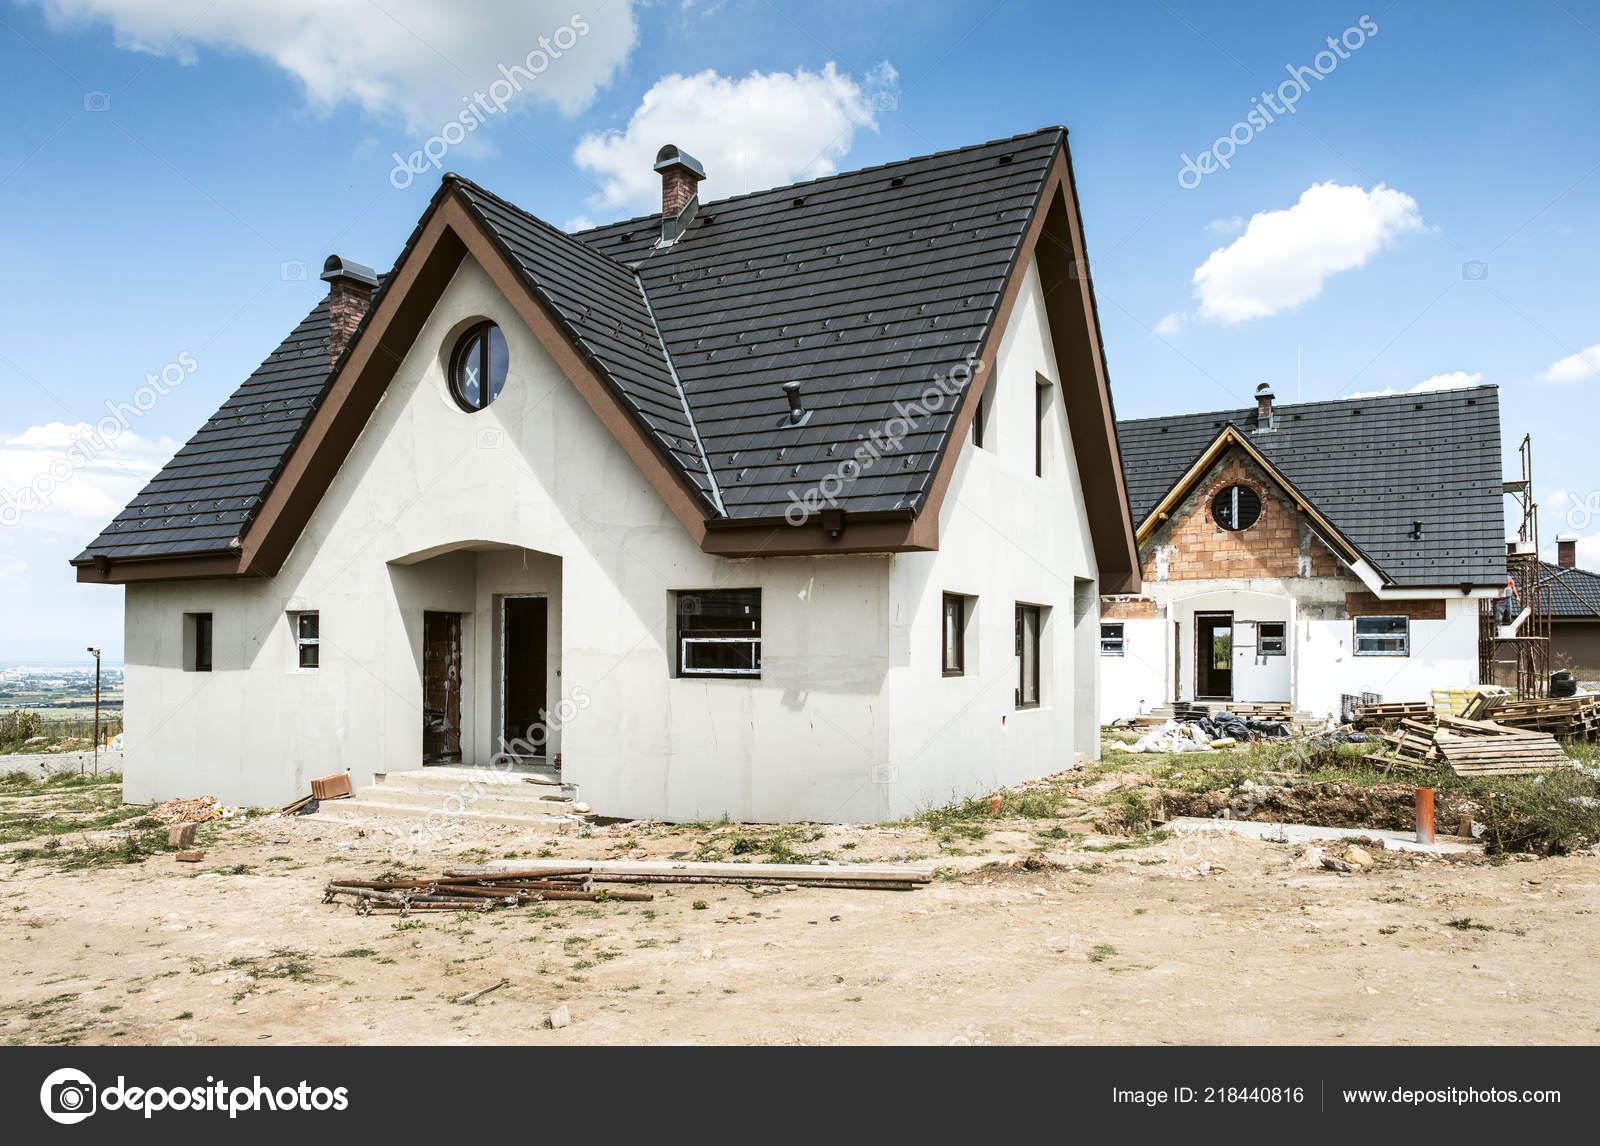 Small New Build Houses Stock Photo C Deyangeorgiev2 218440816